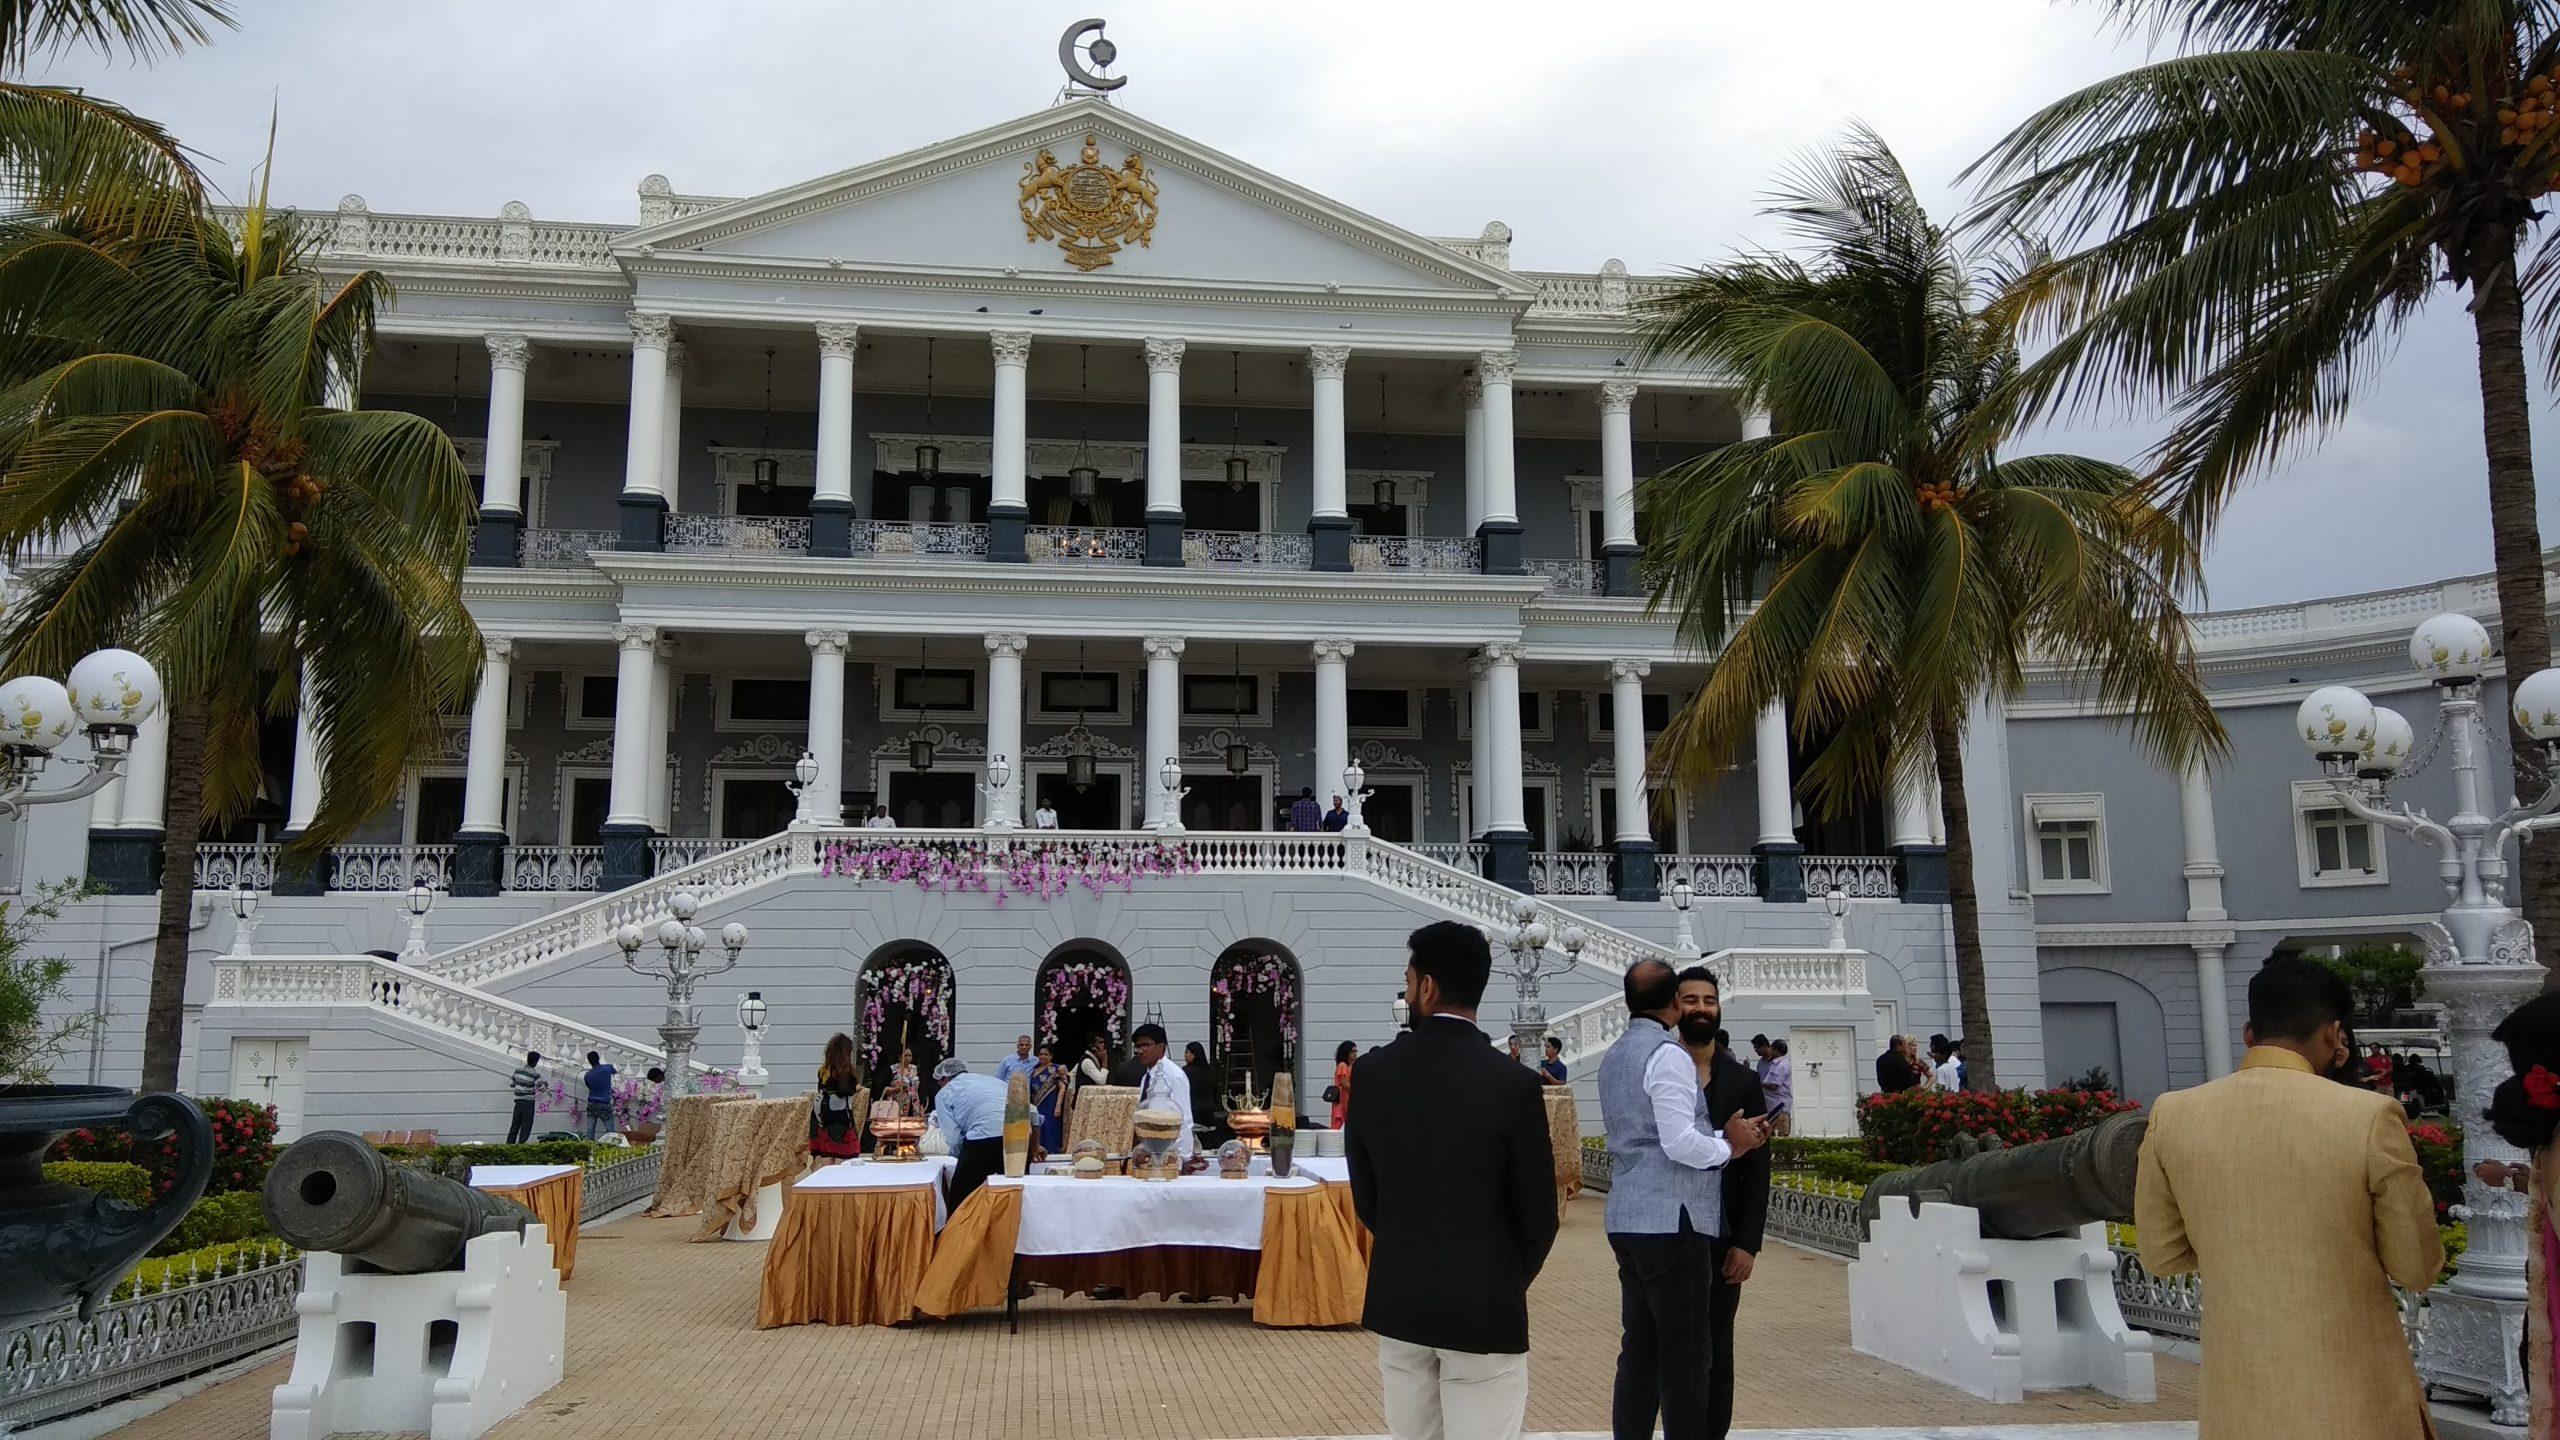 Falaknuma Palace of Hyderabad - Revisit The Grandeur of Nizams and Begums